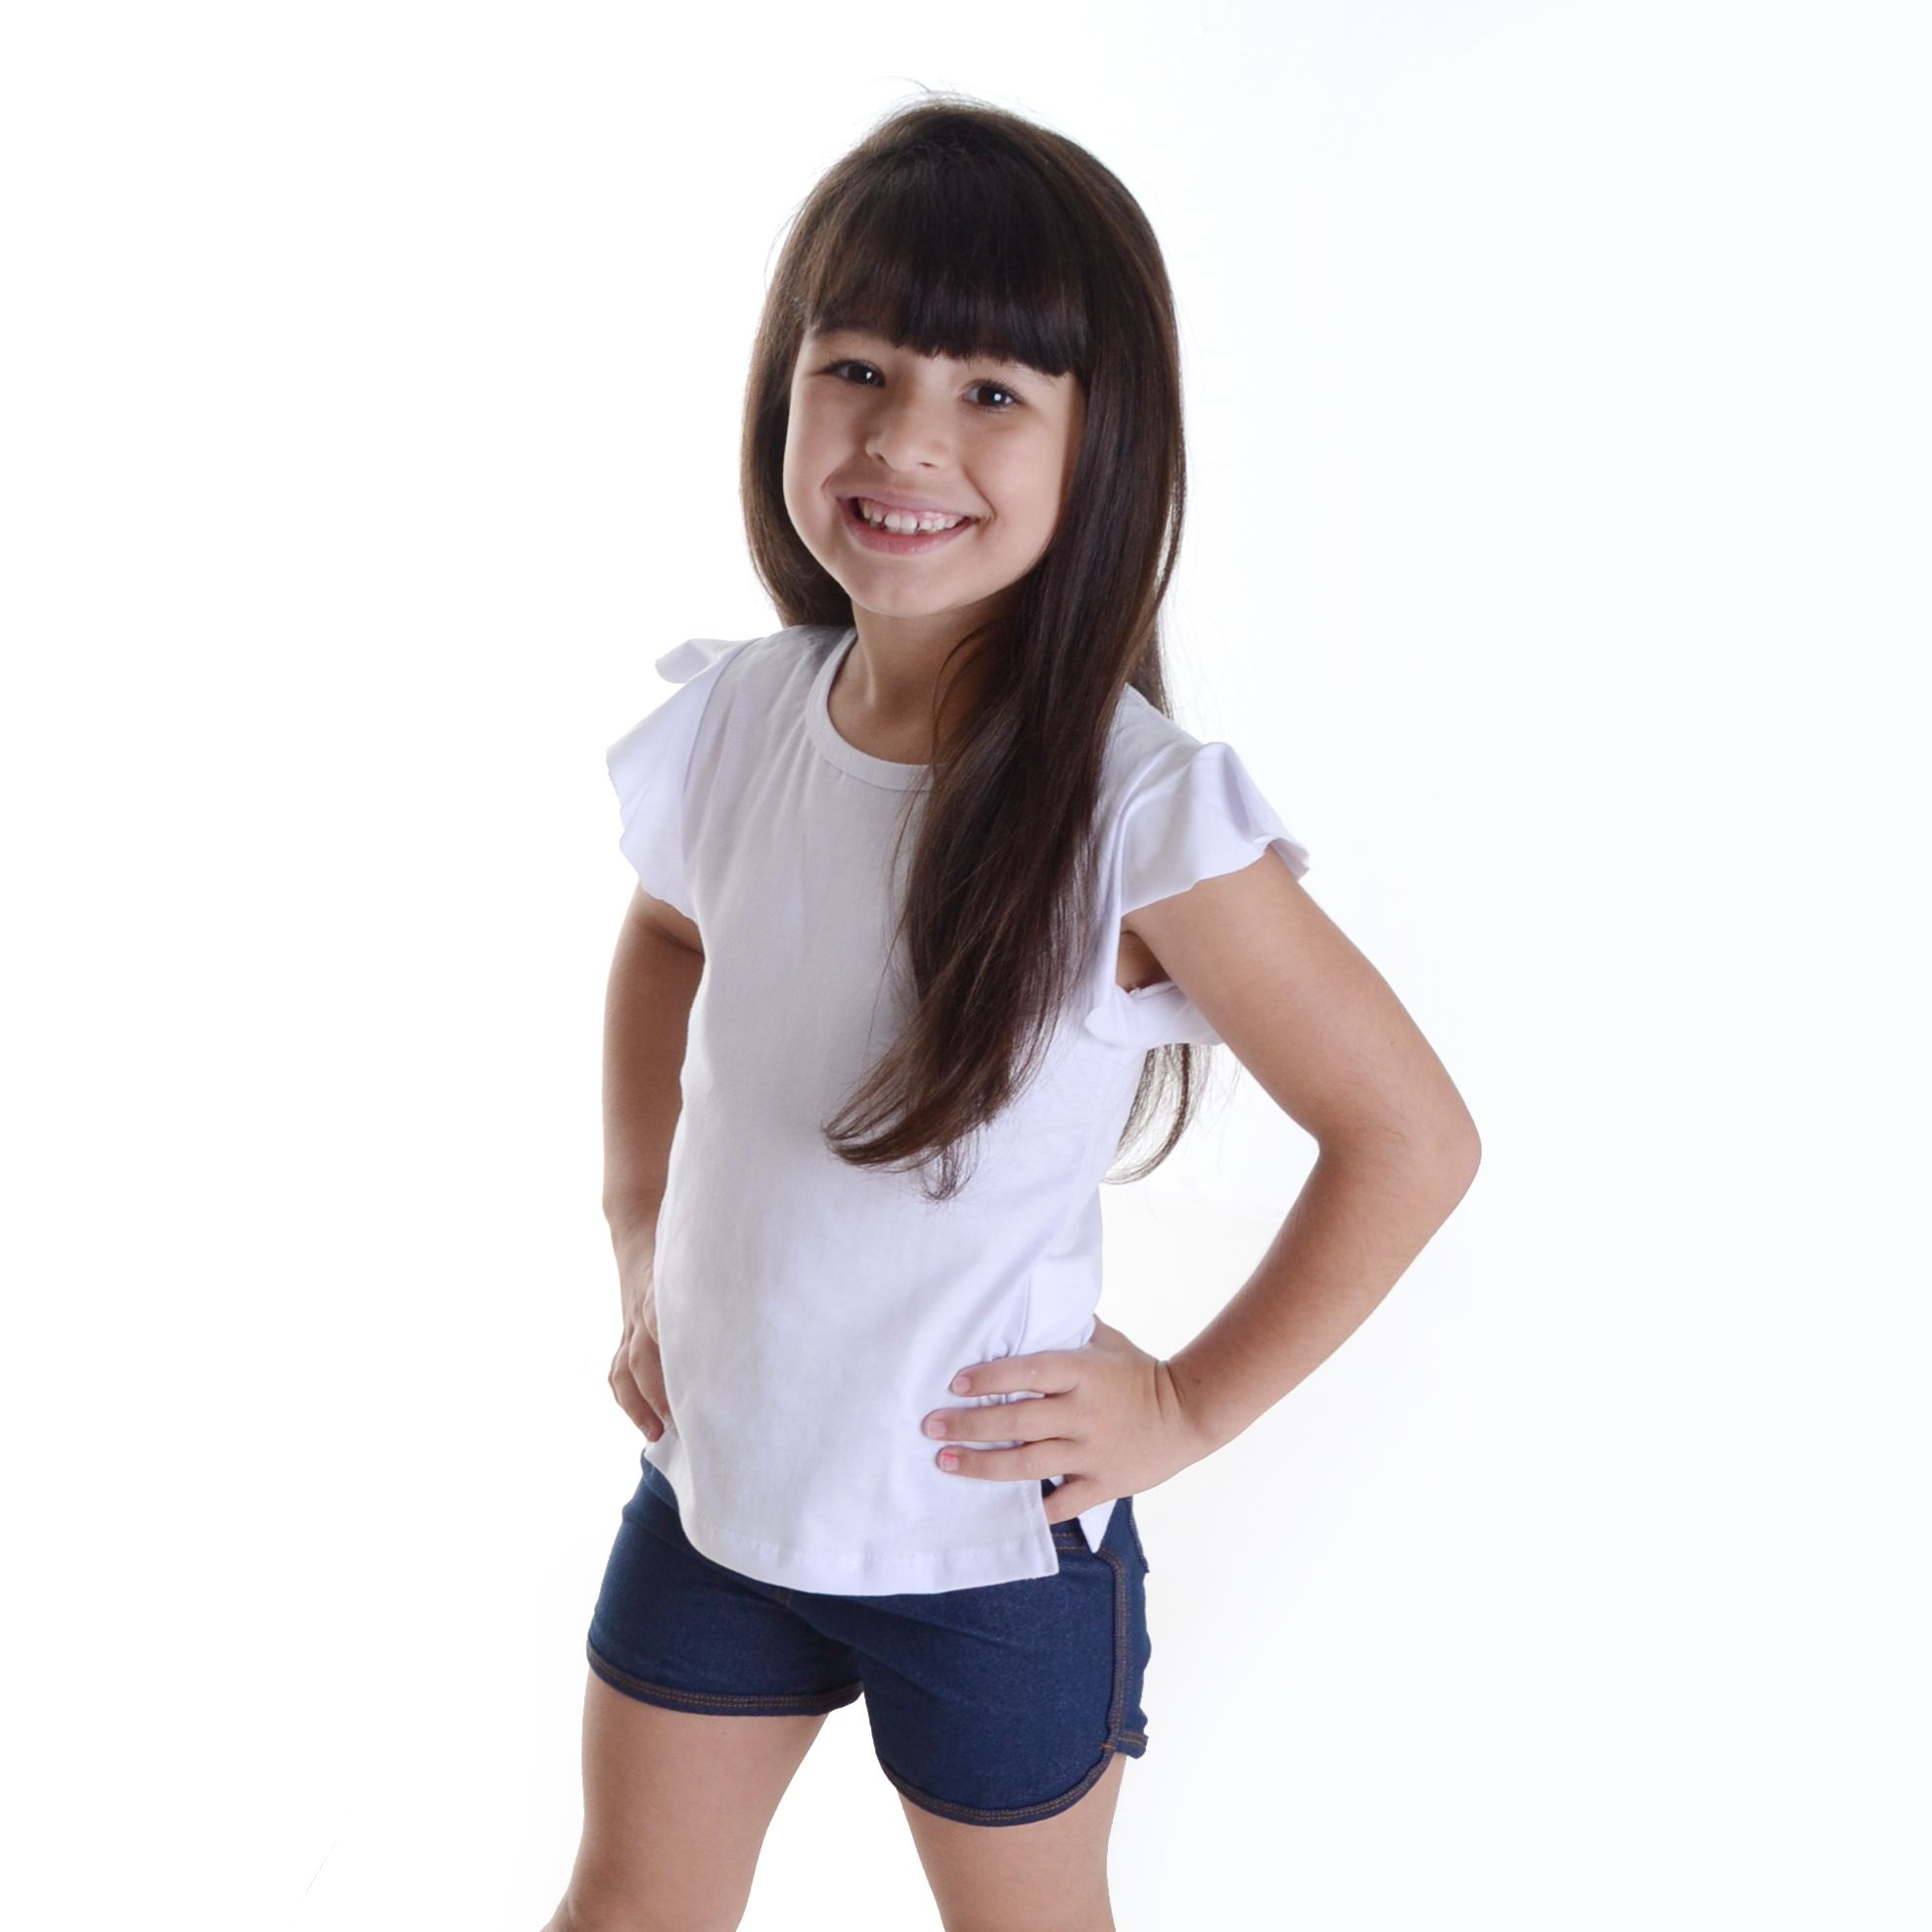 Moda Infantil<br>linha<br><b> it basic</b>